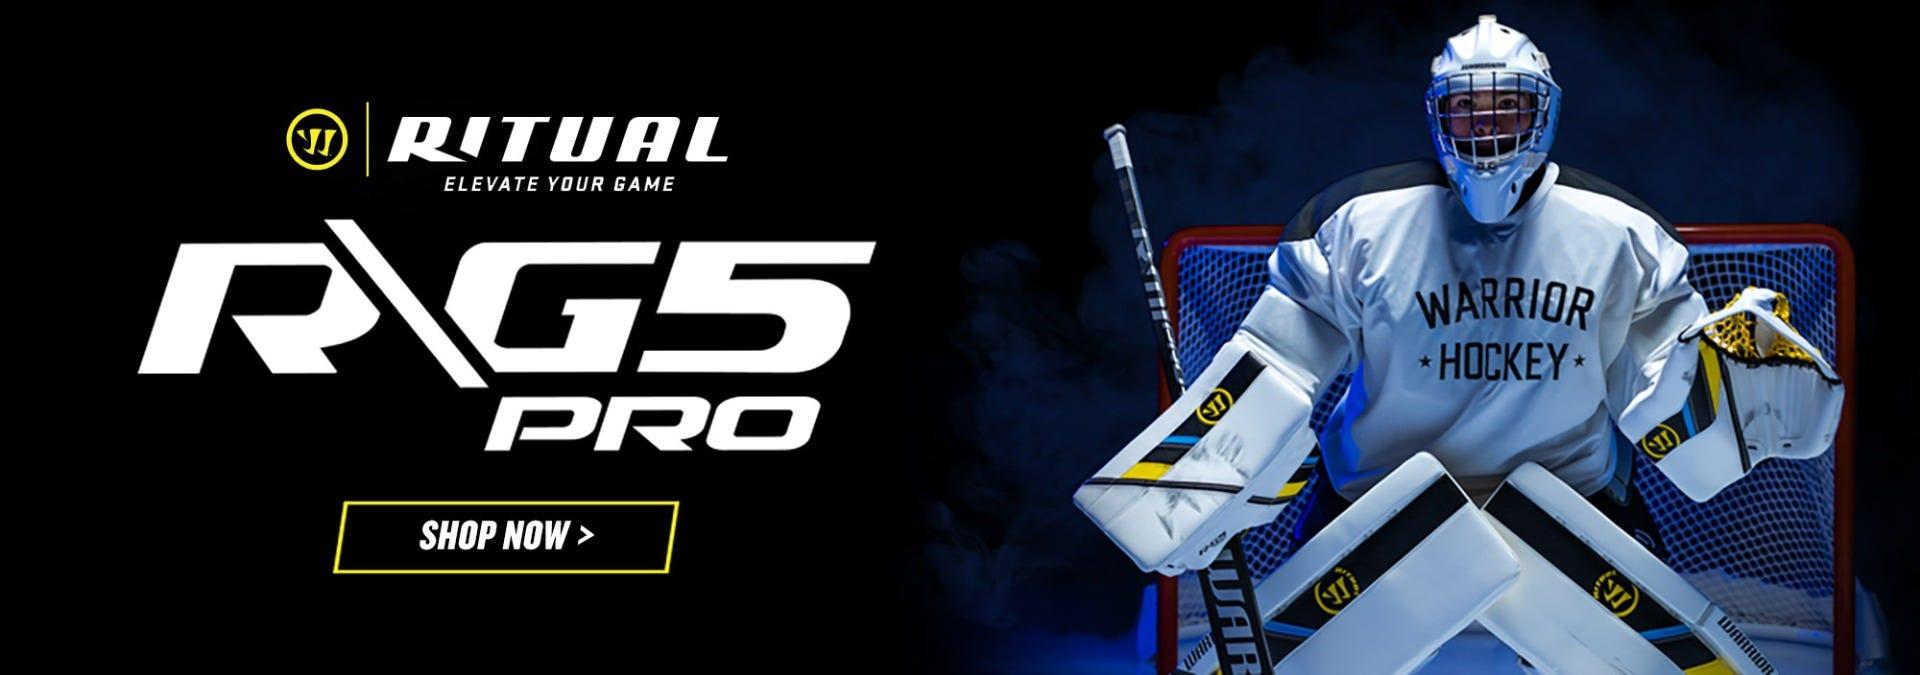 Warrior Ritual G5 Goalie Equipment